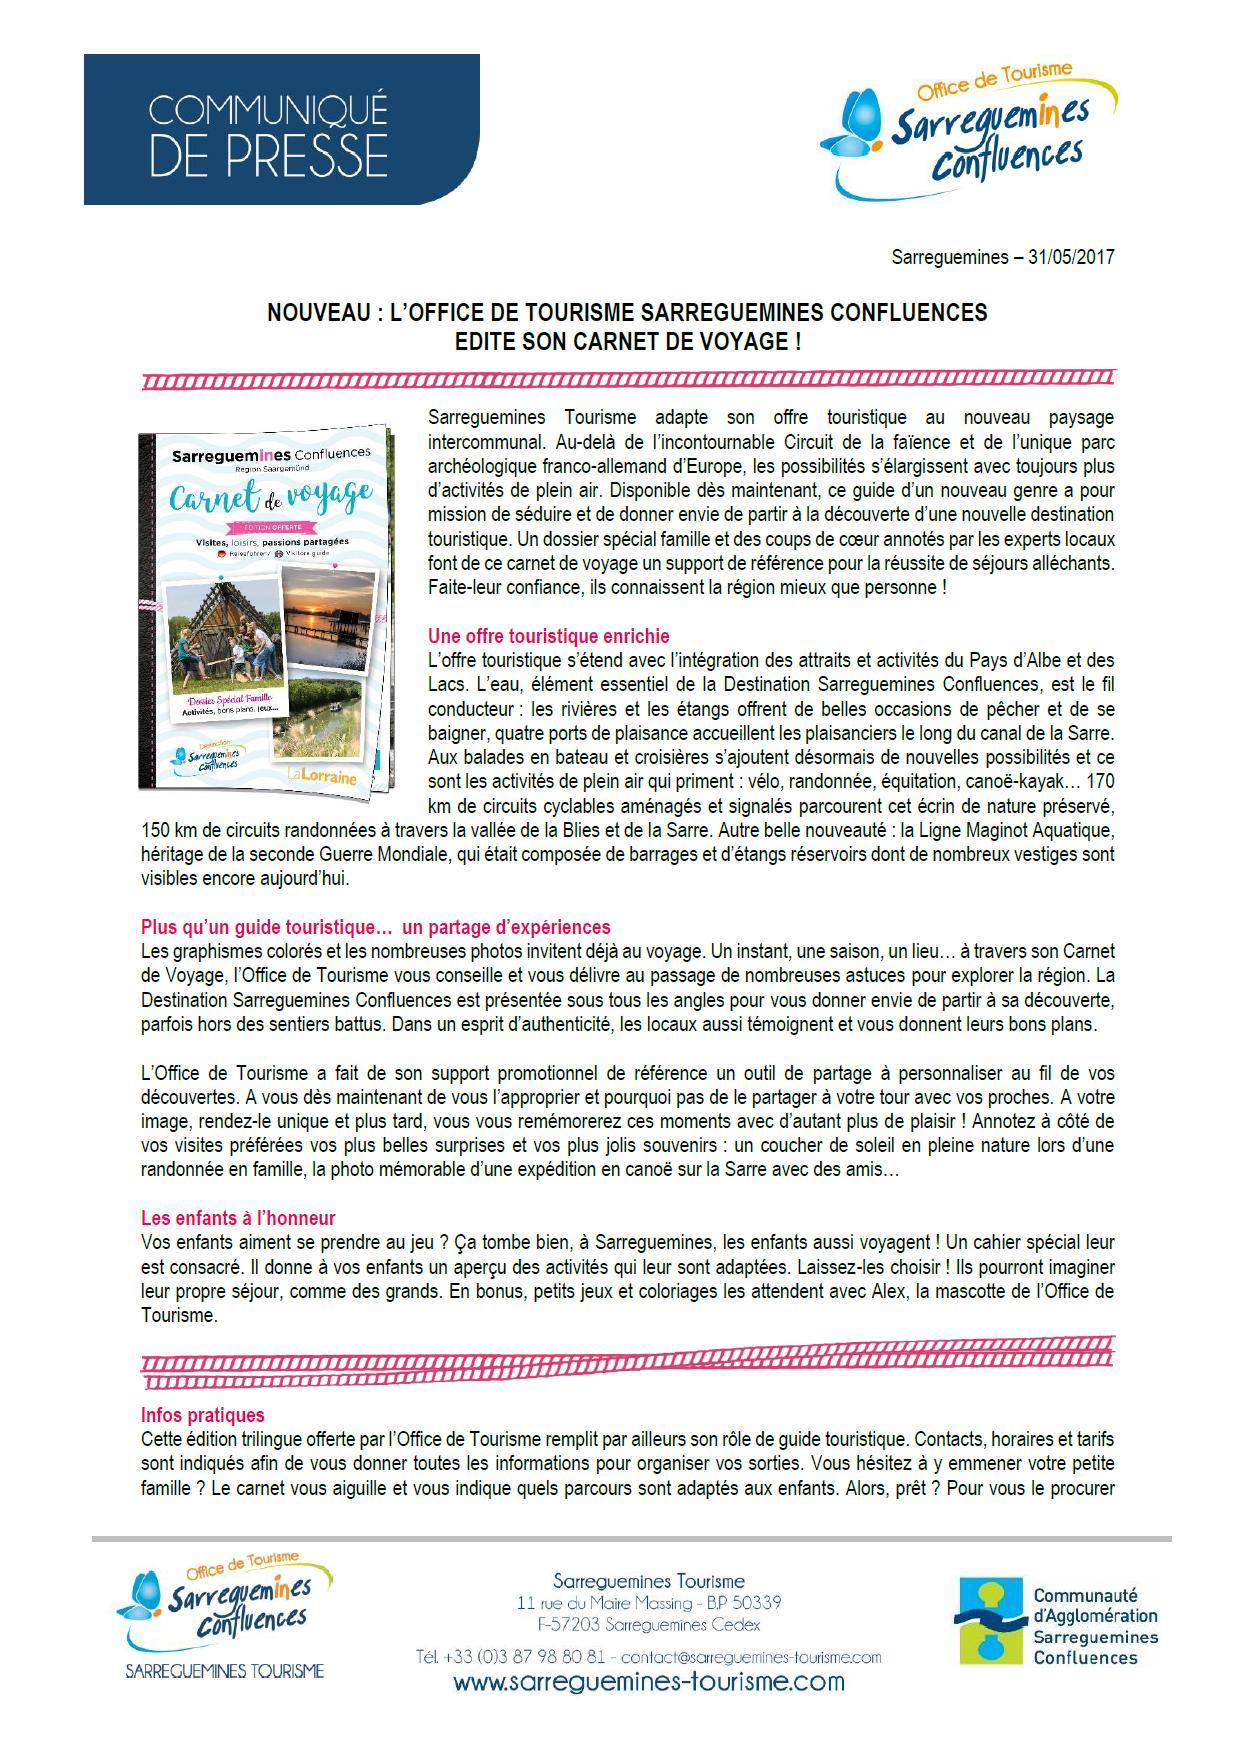 cp-office-tourisme-sareguemines